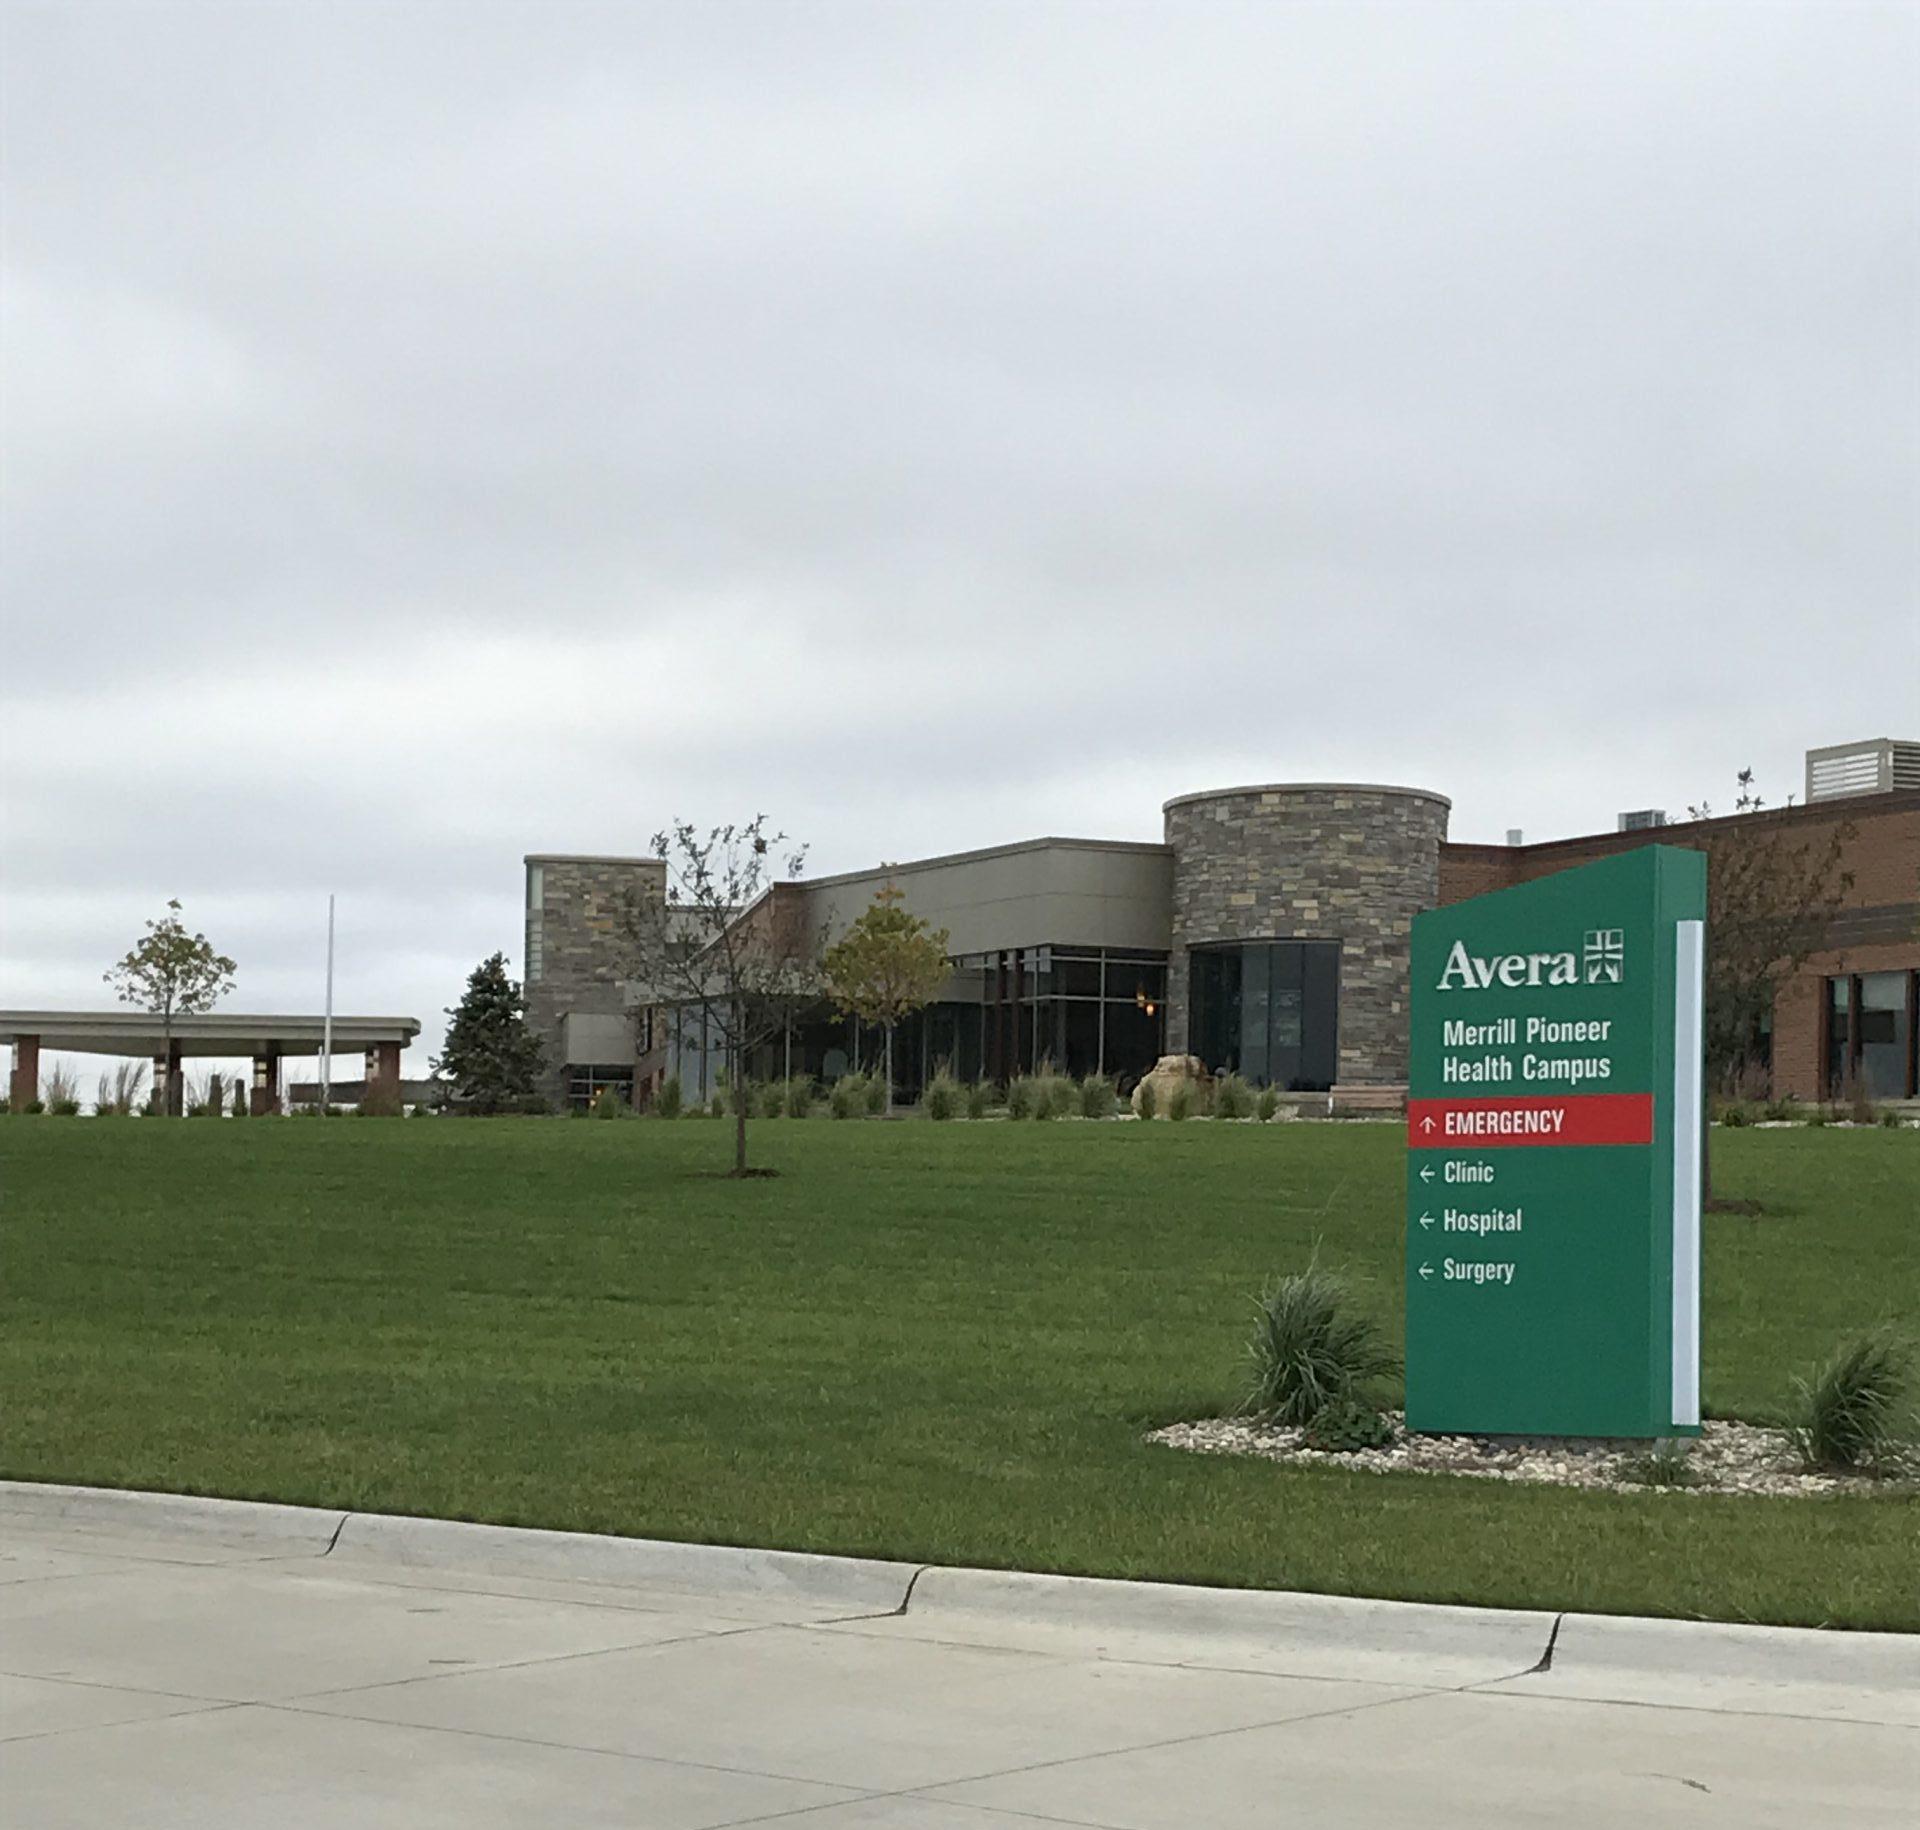 Merrill Pioneer Community Hospital